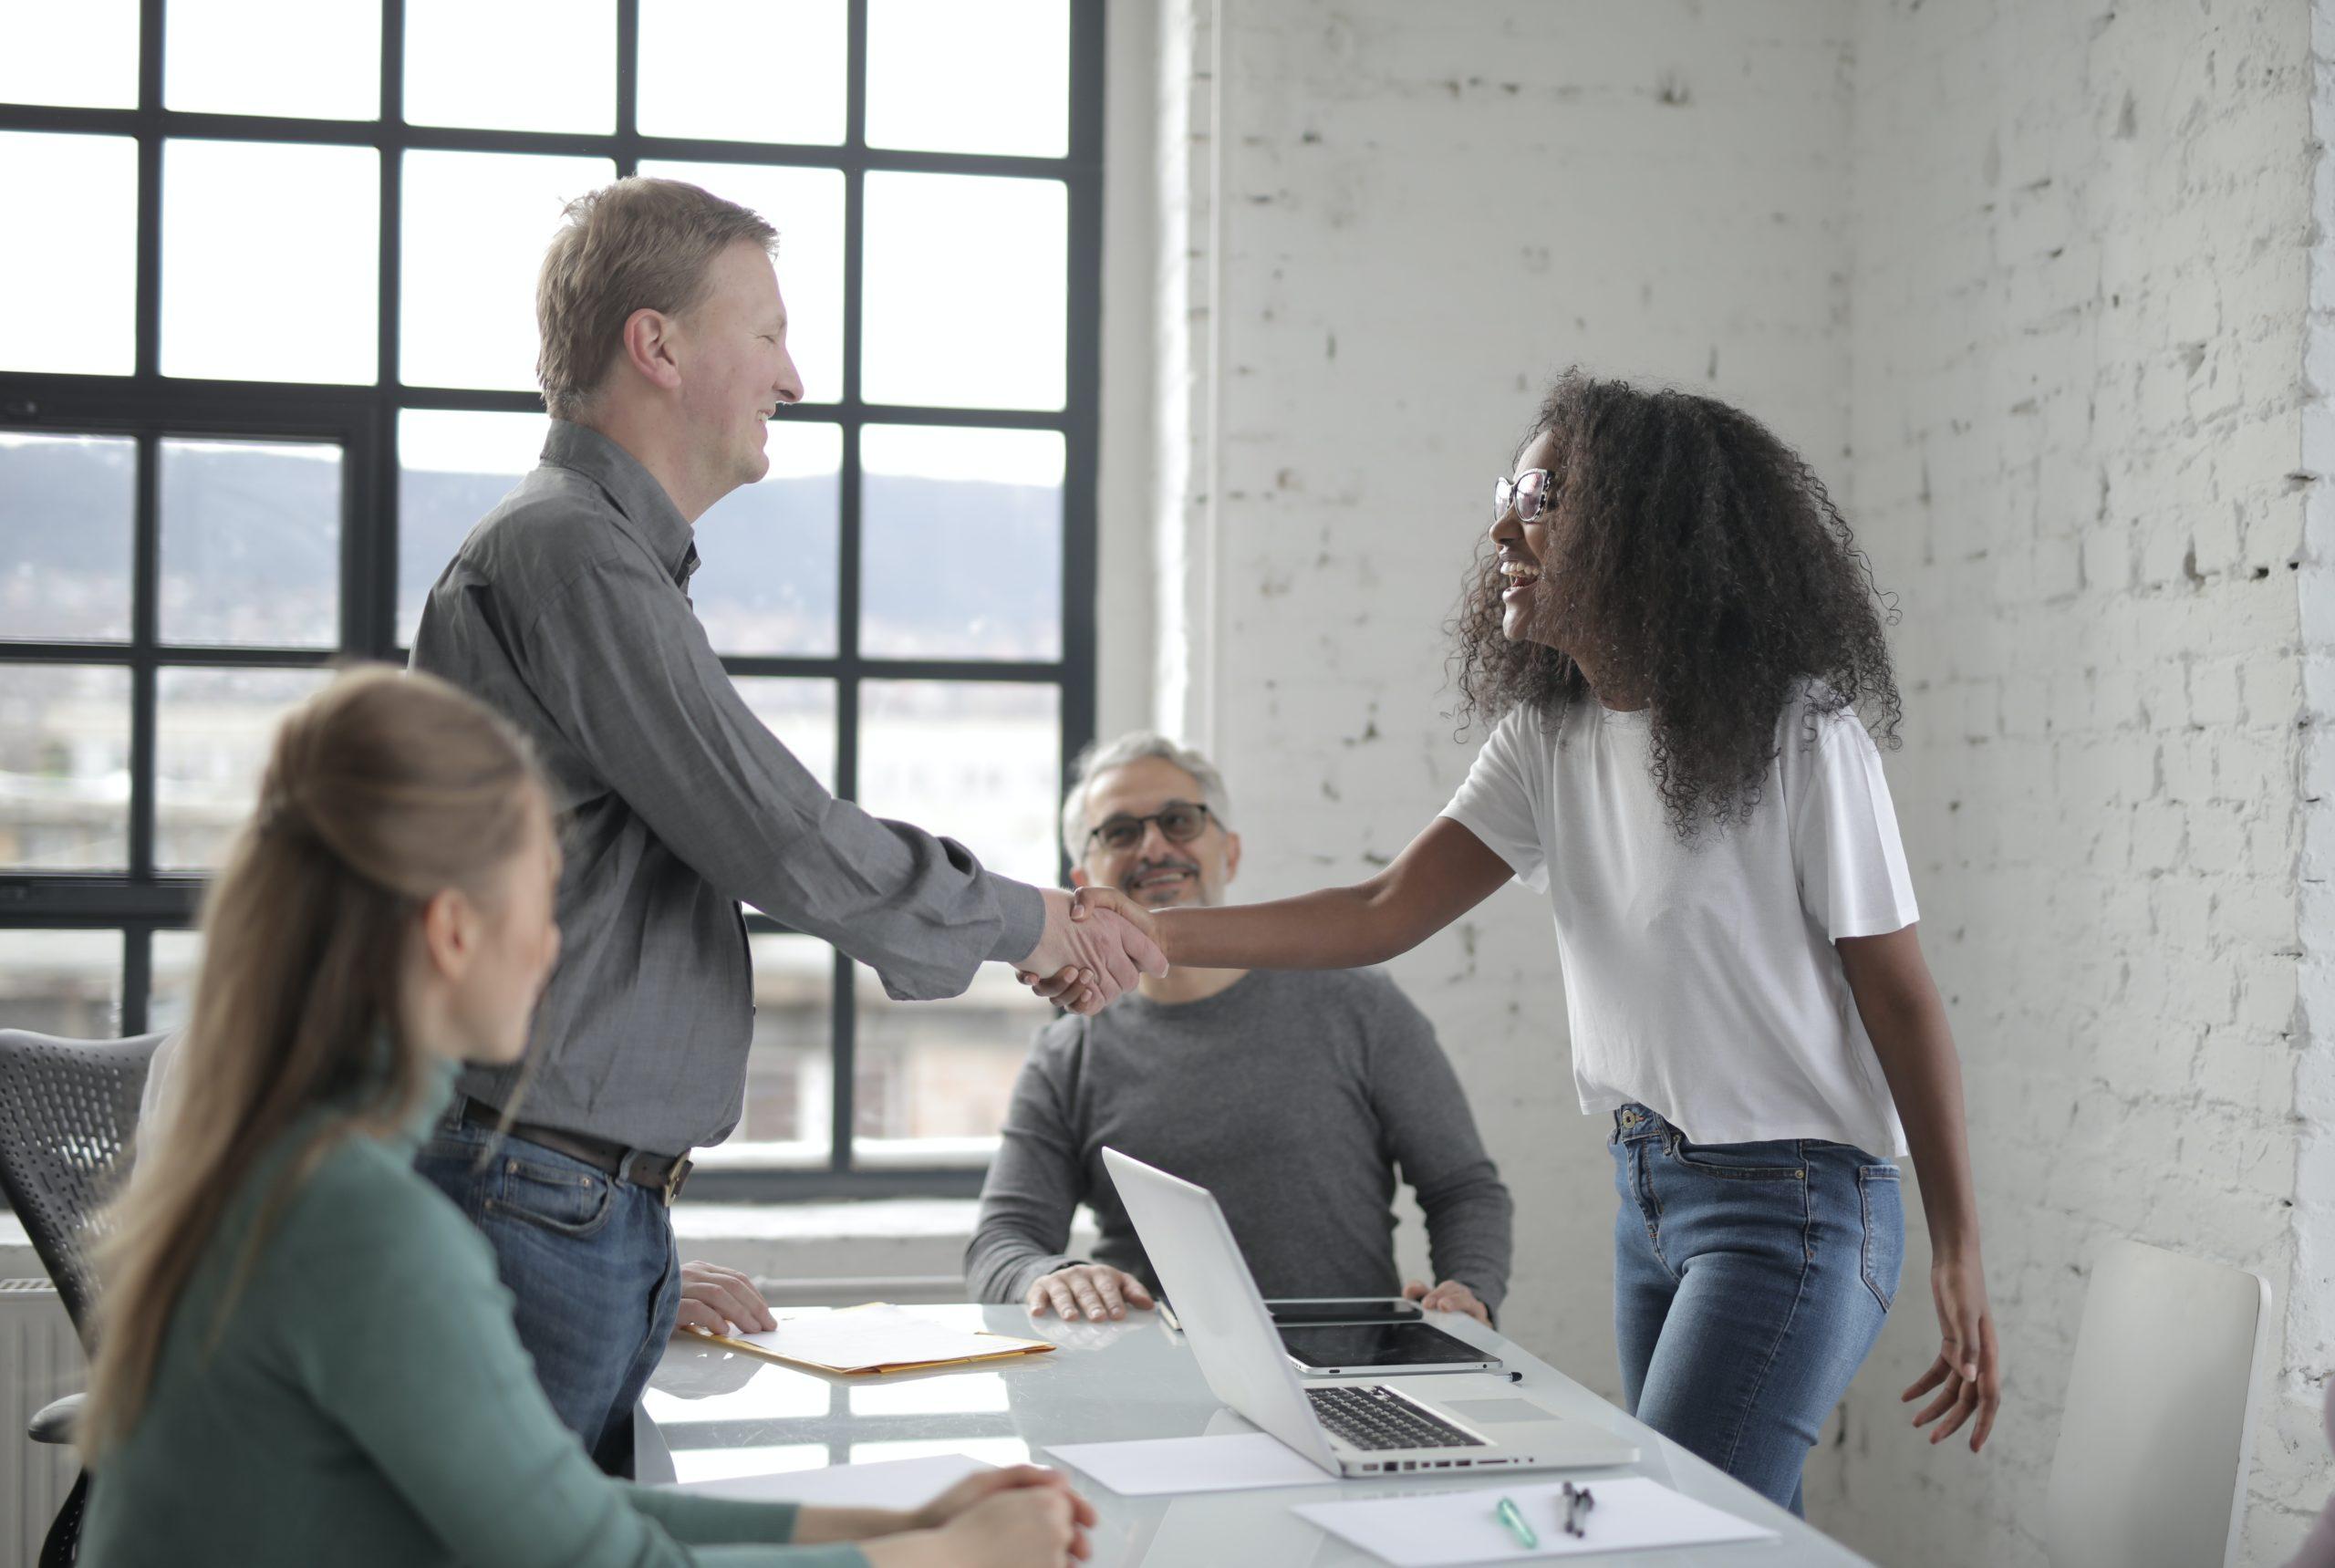 momentum, chamber of commerce, chambers of commerce, chamber, networking, sales, business development